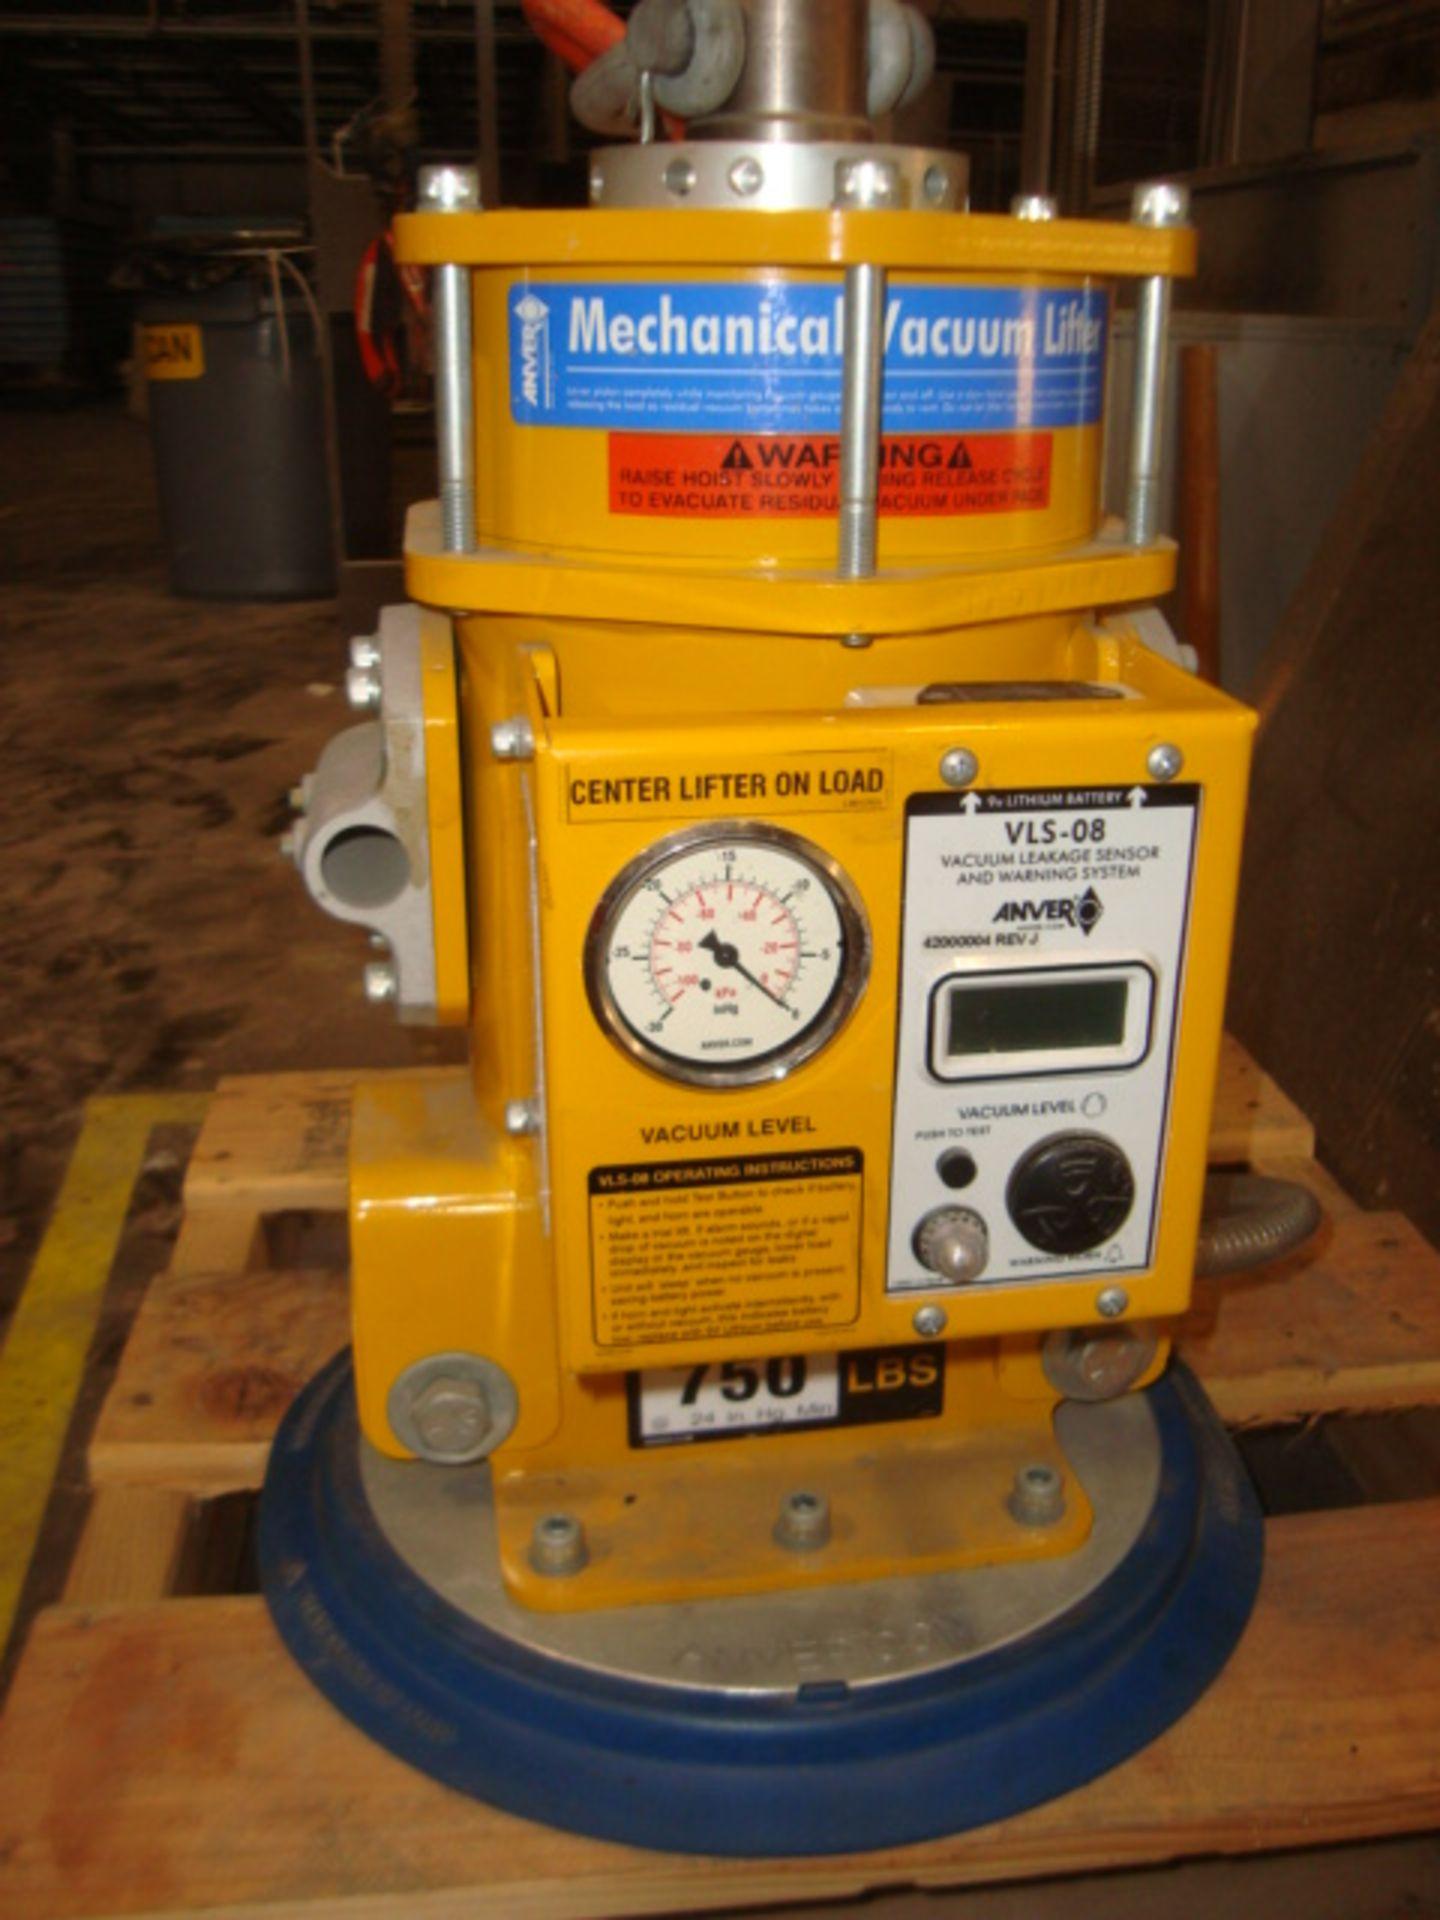 Lot 101 - Mechanical Vacuum Lifter